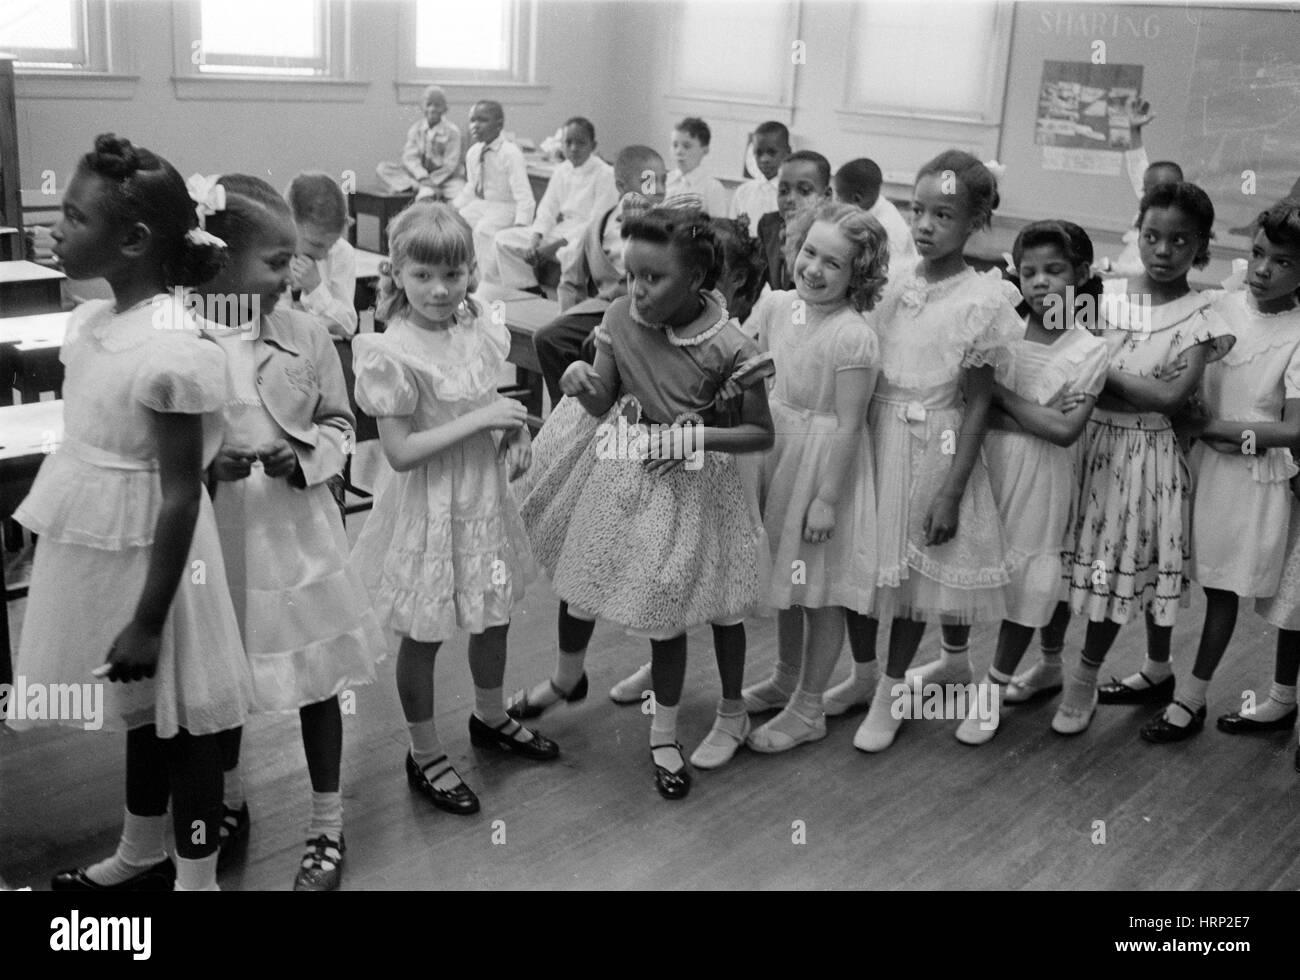 Integrierte Schule, Washington DC, 1955 Stockbild